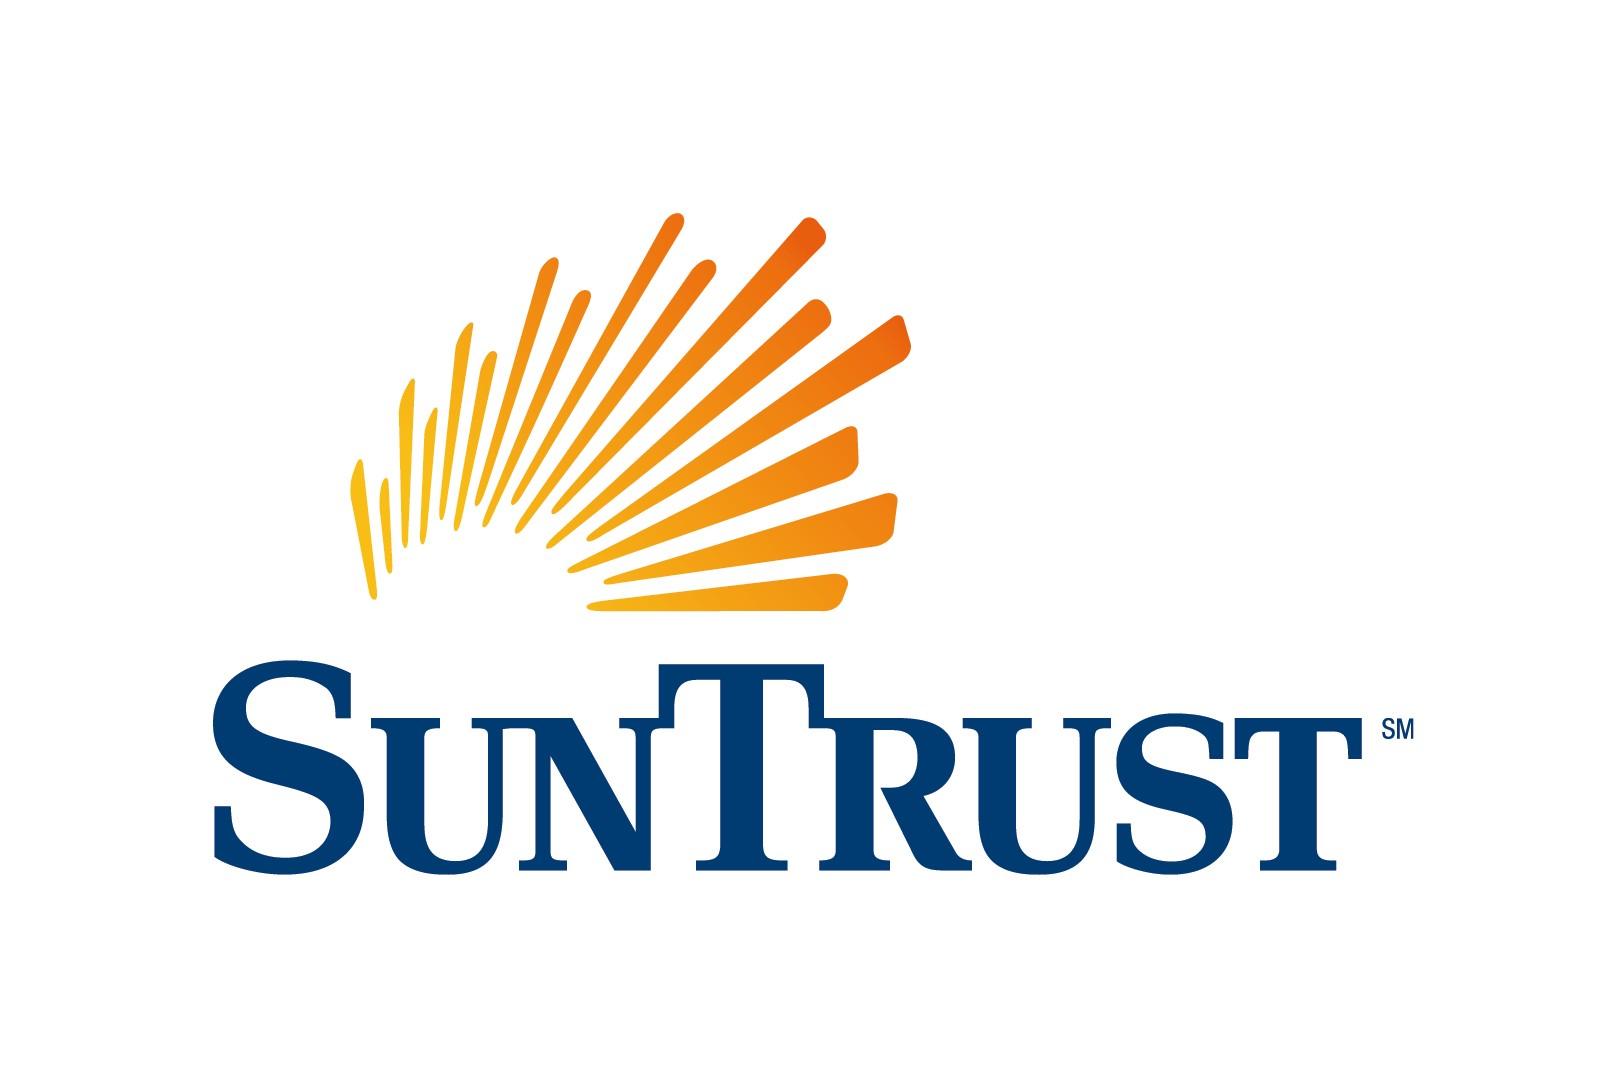 Logo Sun Solar Logos Datsun Bacardi Illuminati Corporate